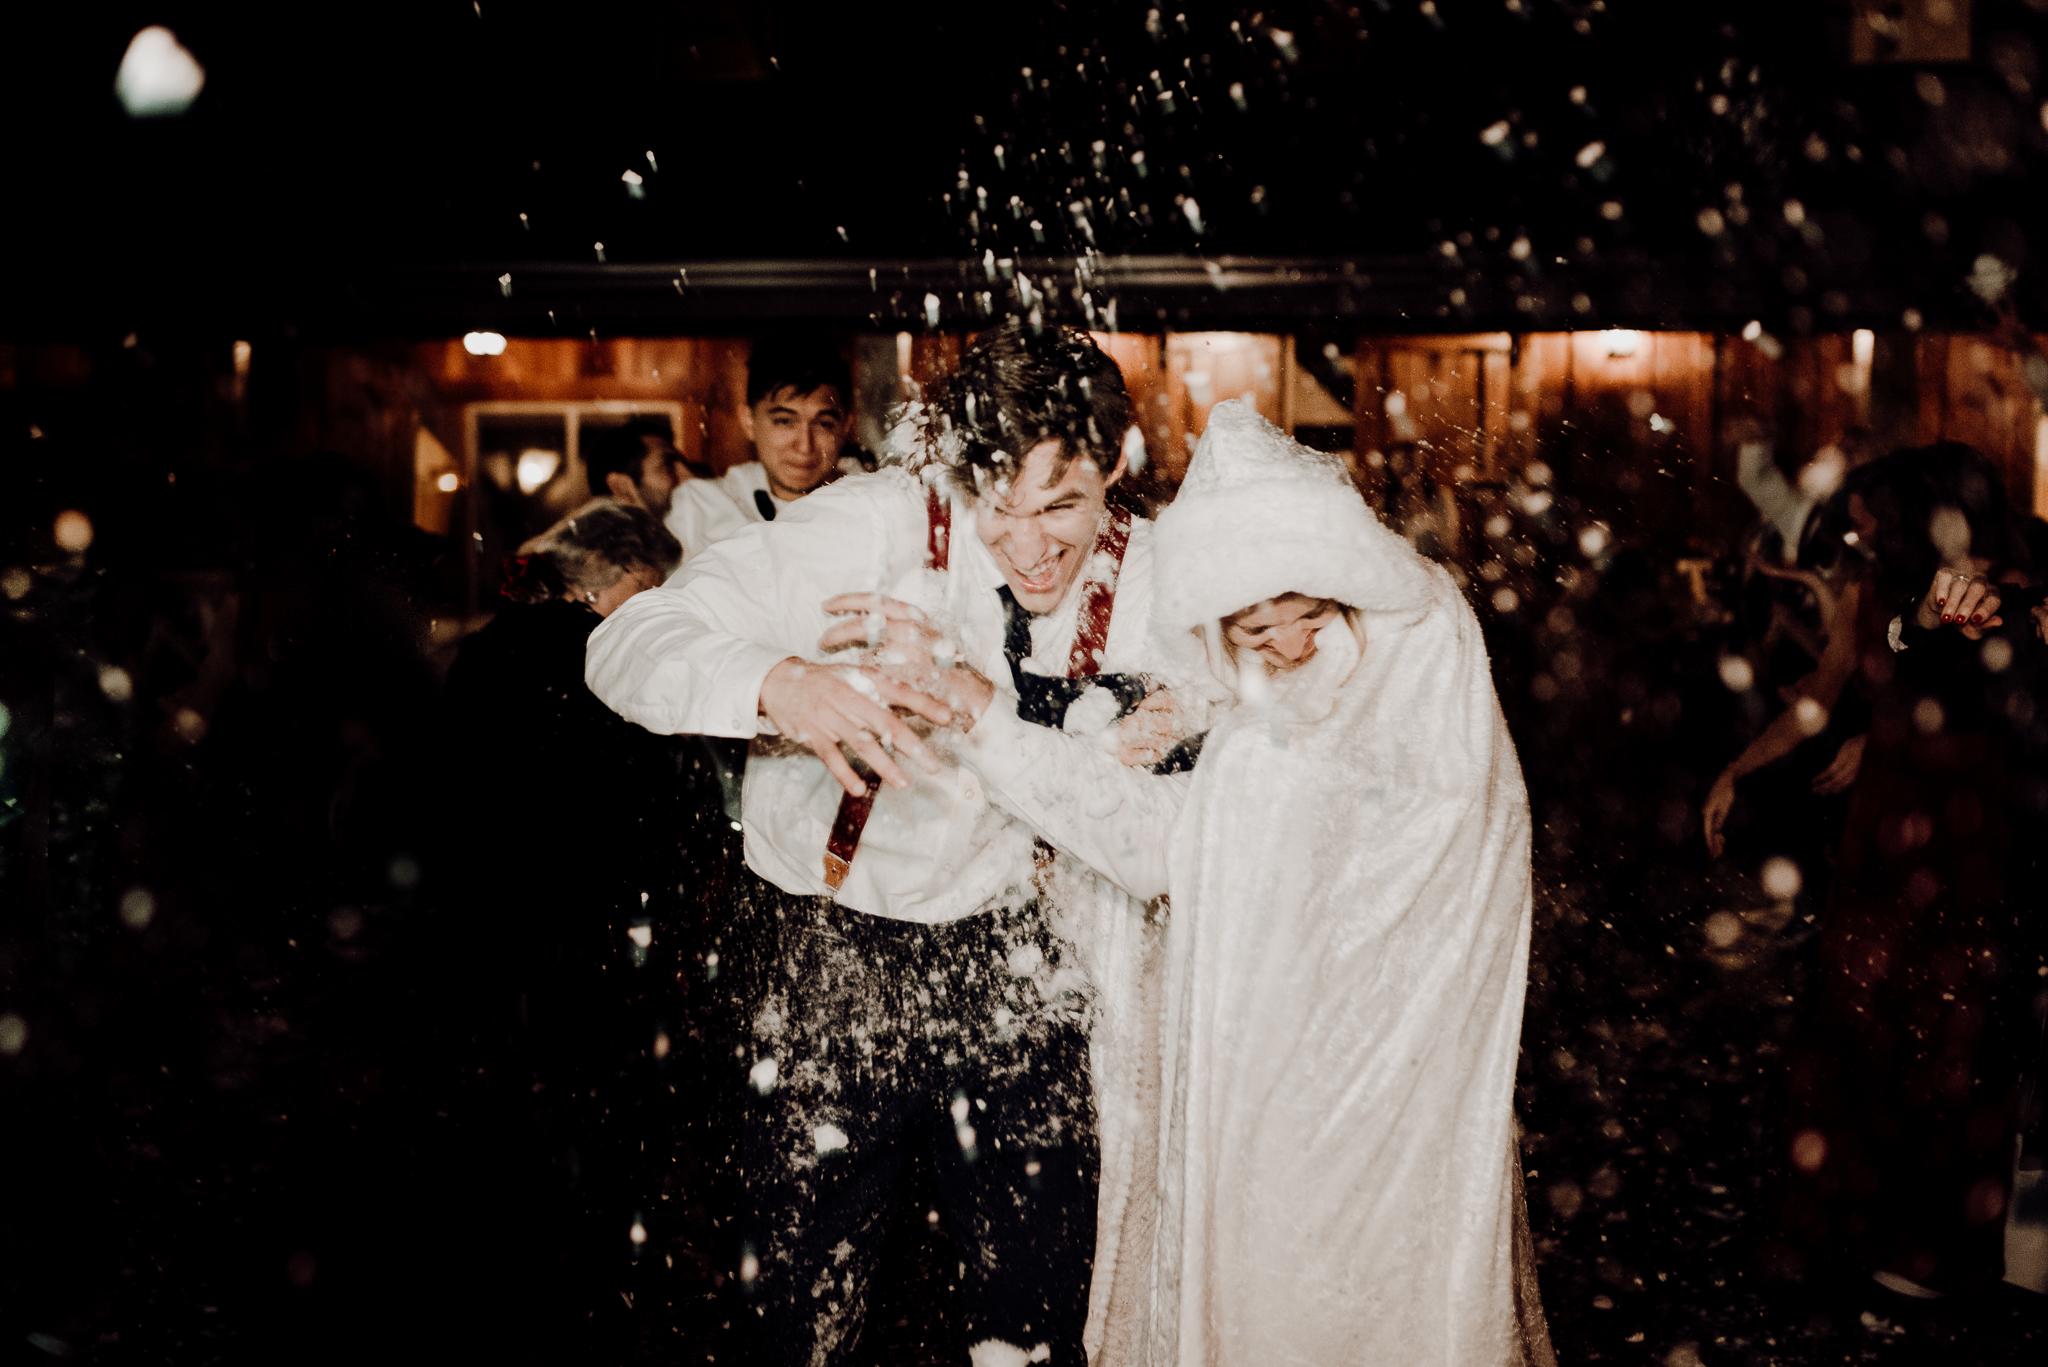 Michelle + Aron-Houston Wedding Photographer-Magnolia Meadows-Winter Wedding | Kristen Giles Photography - 111.jpg